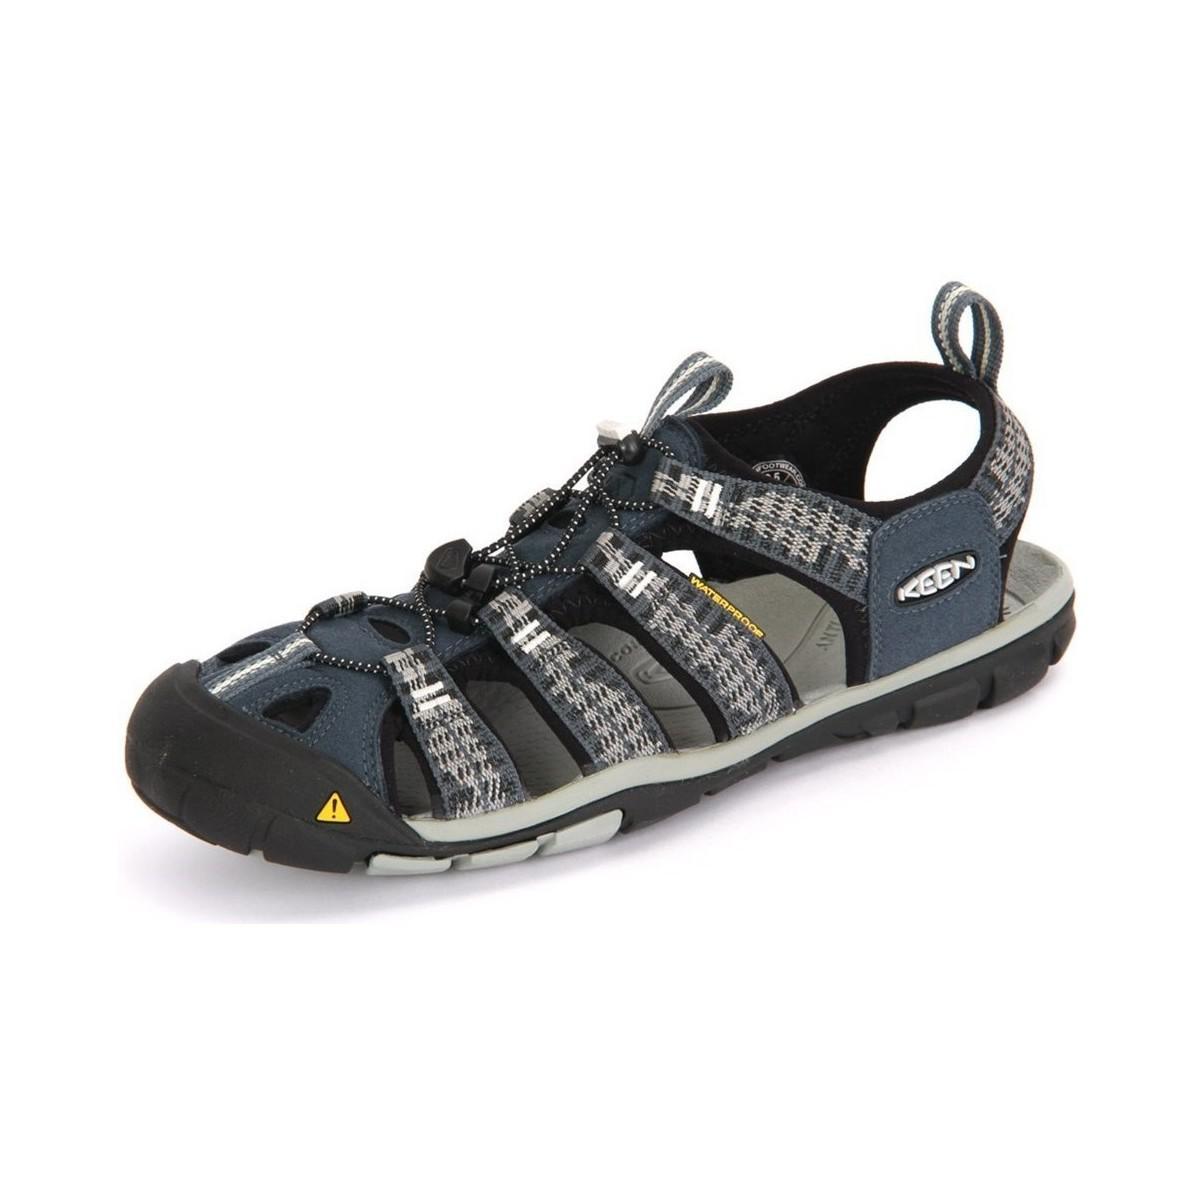 dc1688c13632 Keen Clearwater Cnx Midnight Navy Vapor Men s Sandals In Multicolour ...